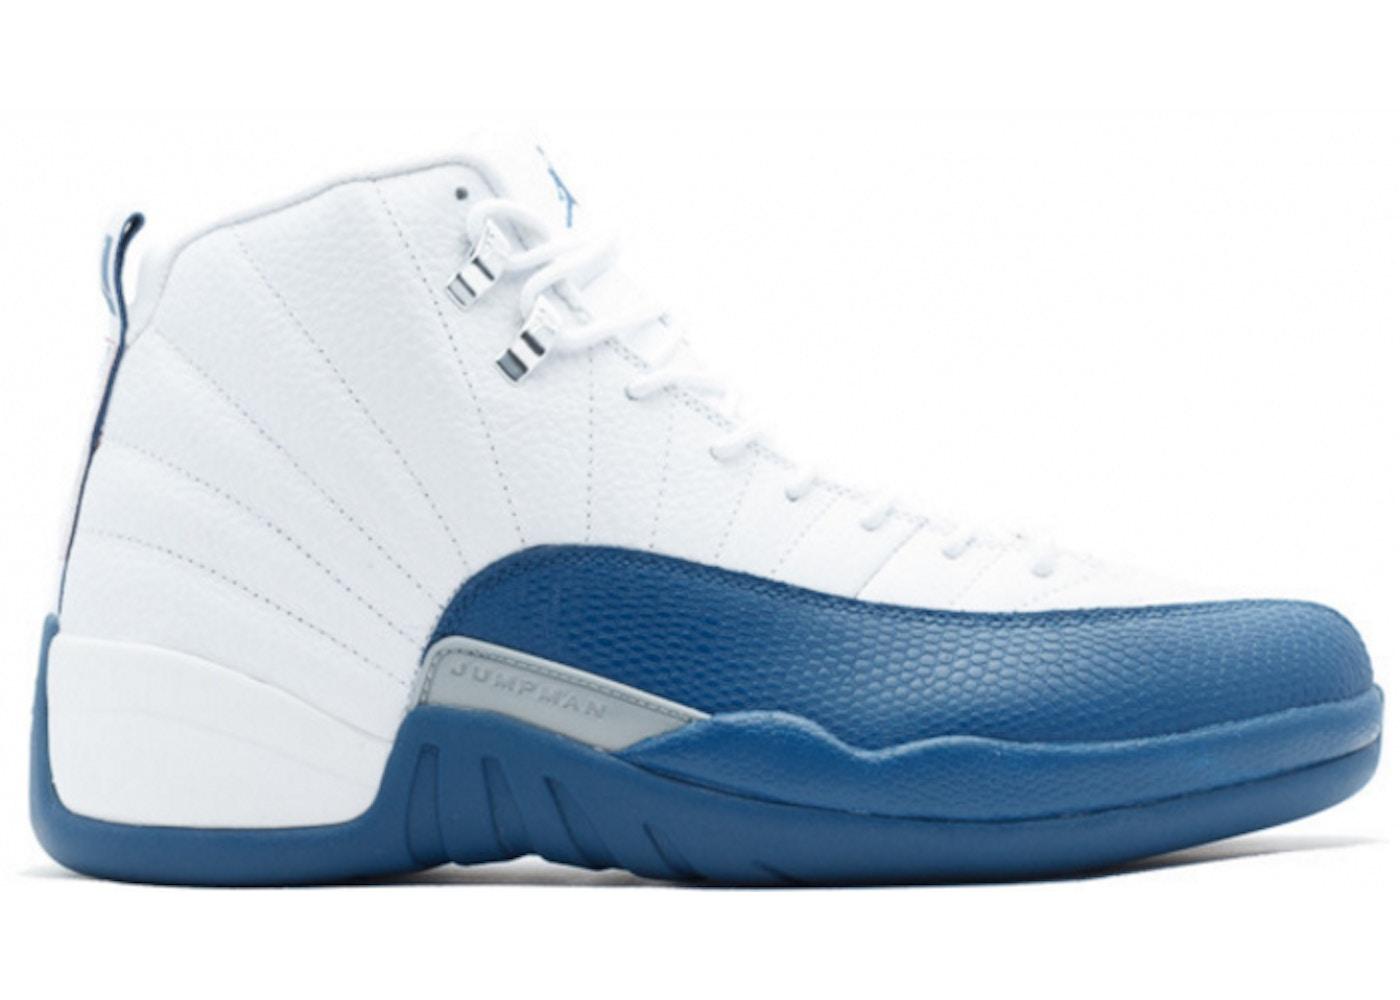 buy popular 018ba f29e6 Buy Air Jordan 12 Shoes & Deadstock Sneakers